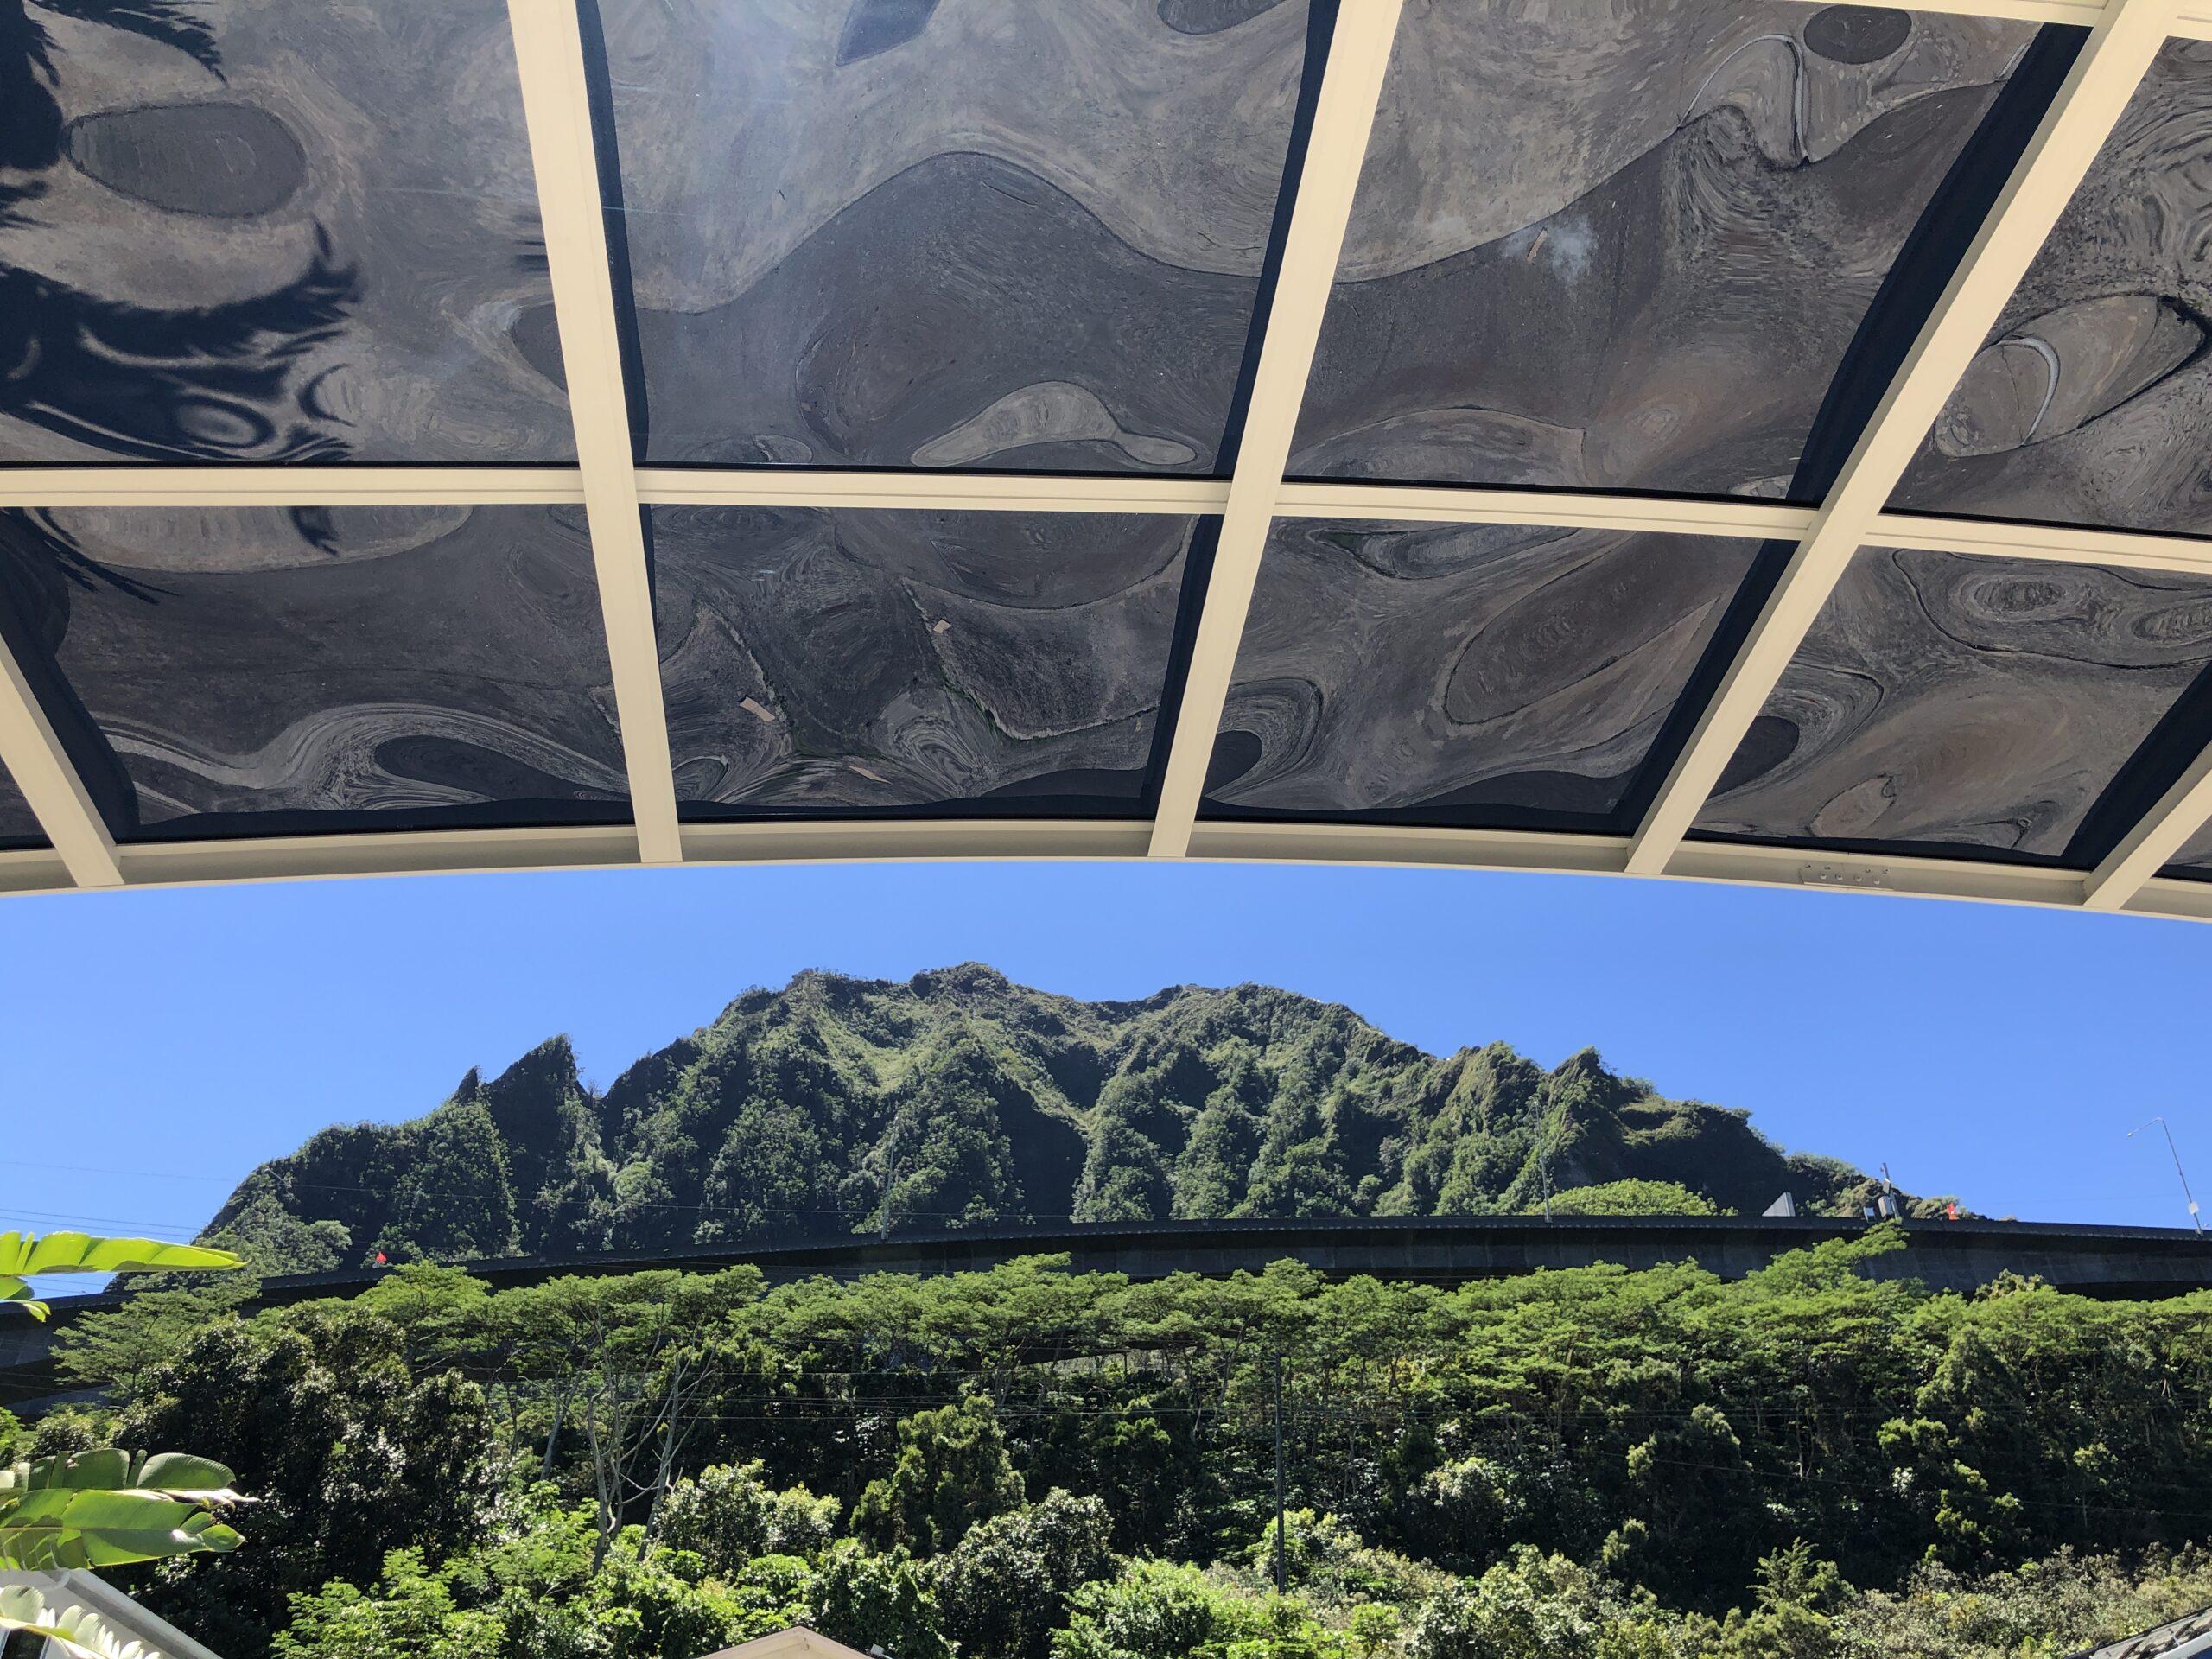 Carports Hawaii, custom carport structure, white aluminum frame with dark polycarbonate roof panels